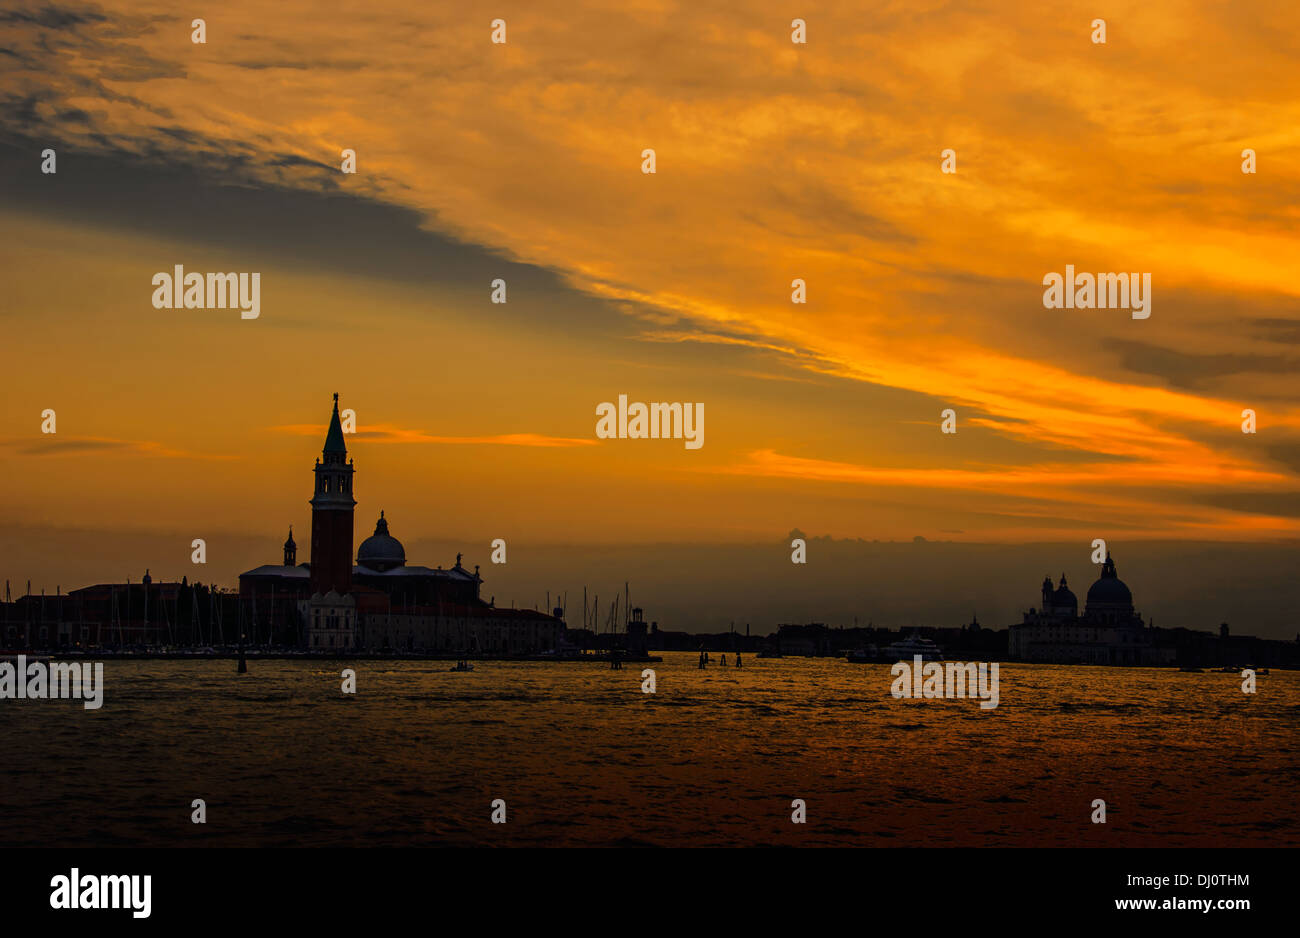 Sunset over St. Giorgio Island and Church, Venice, Italy. Stock Photo